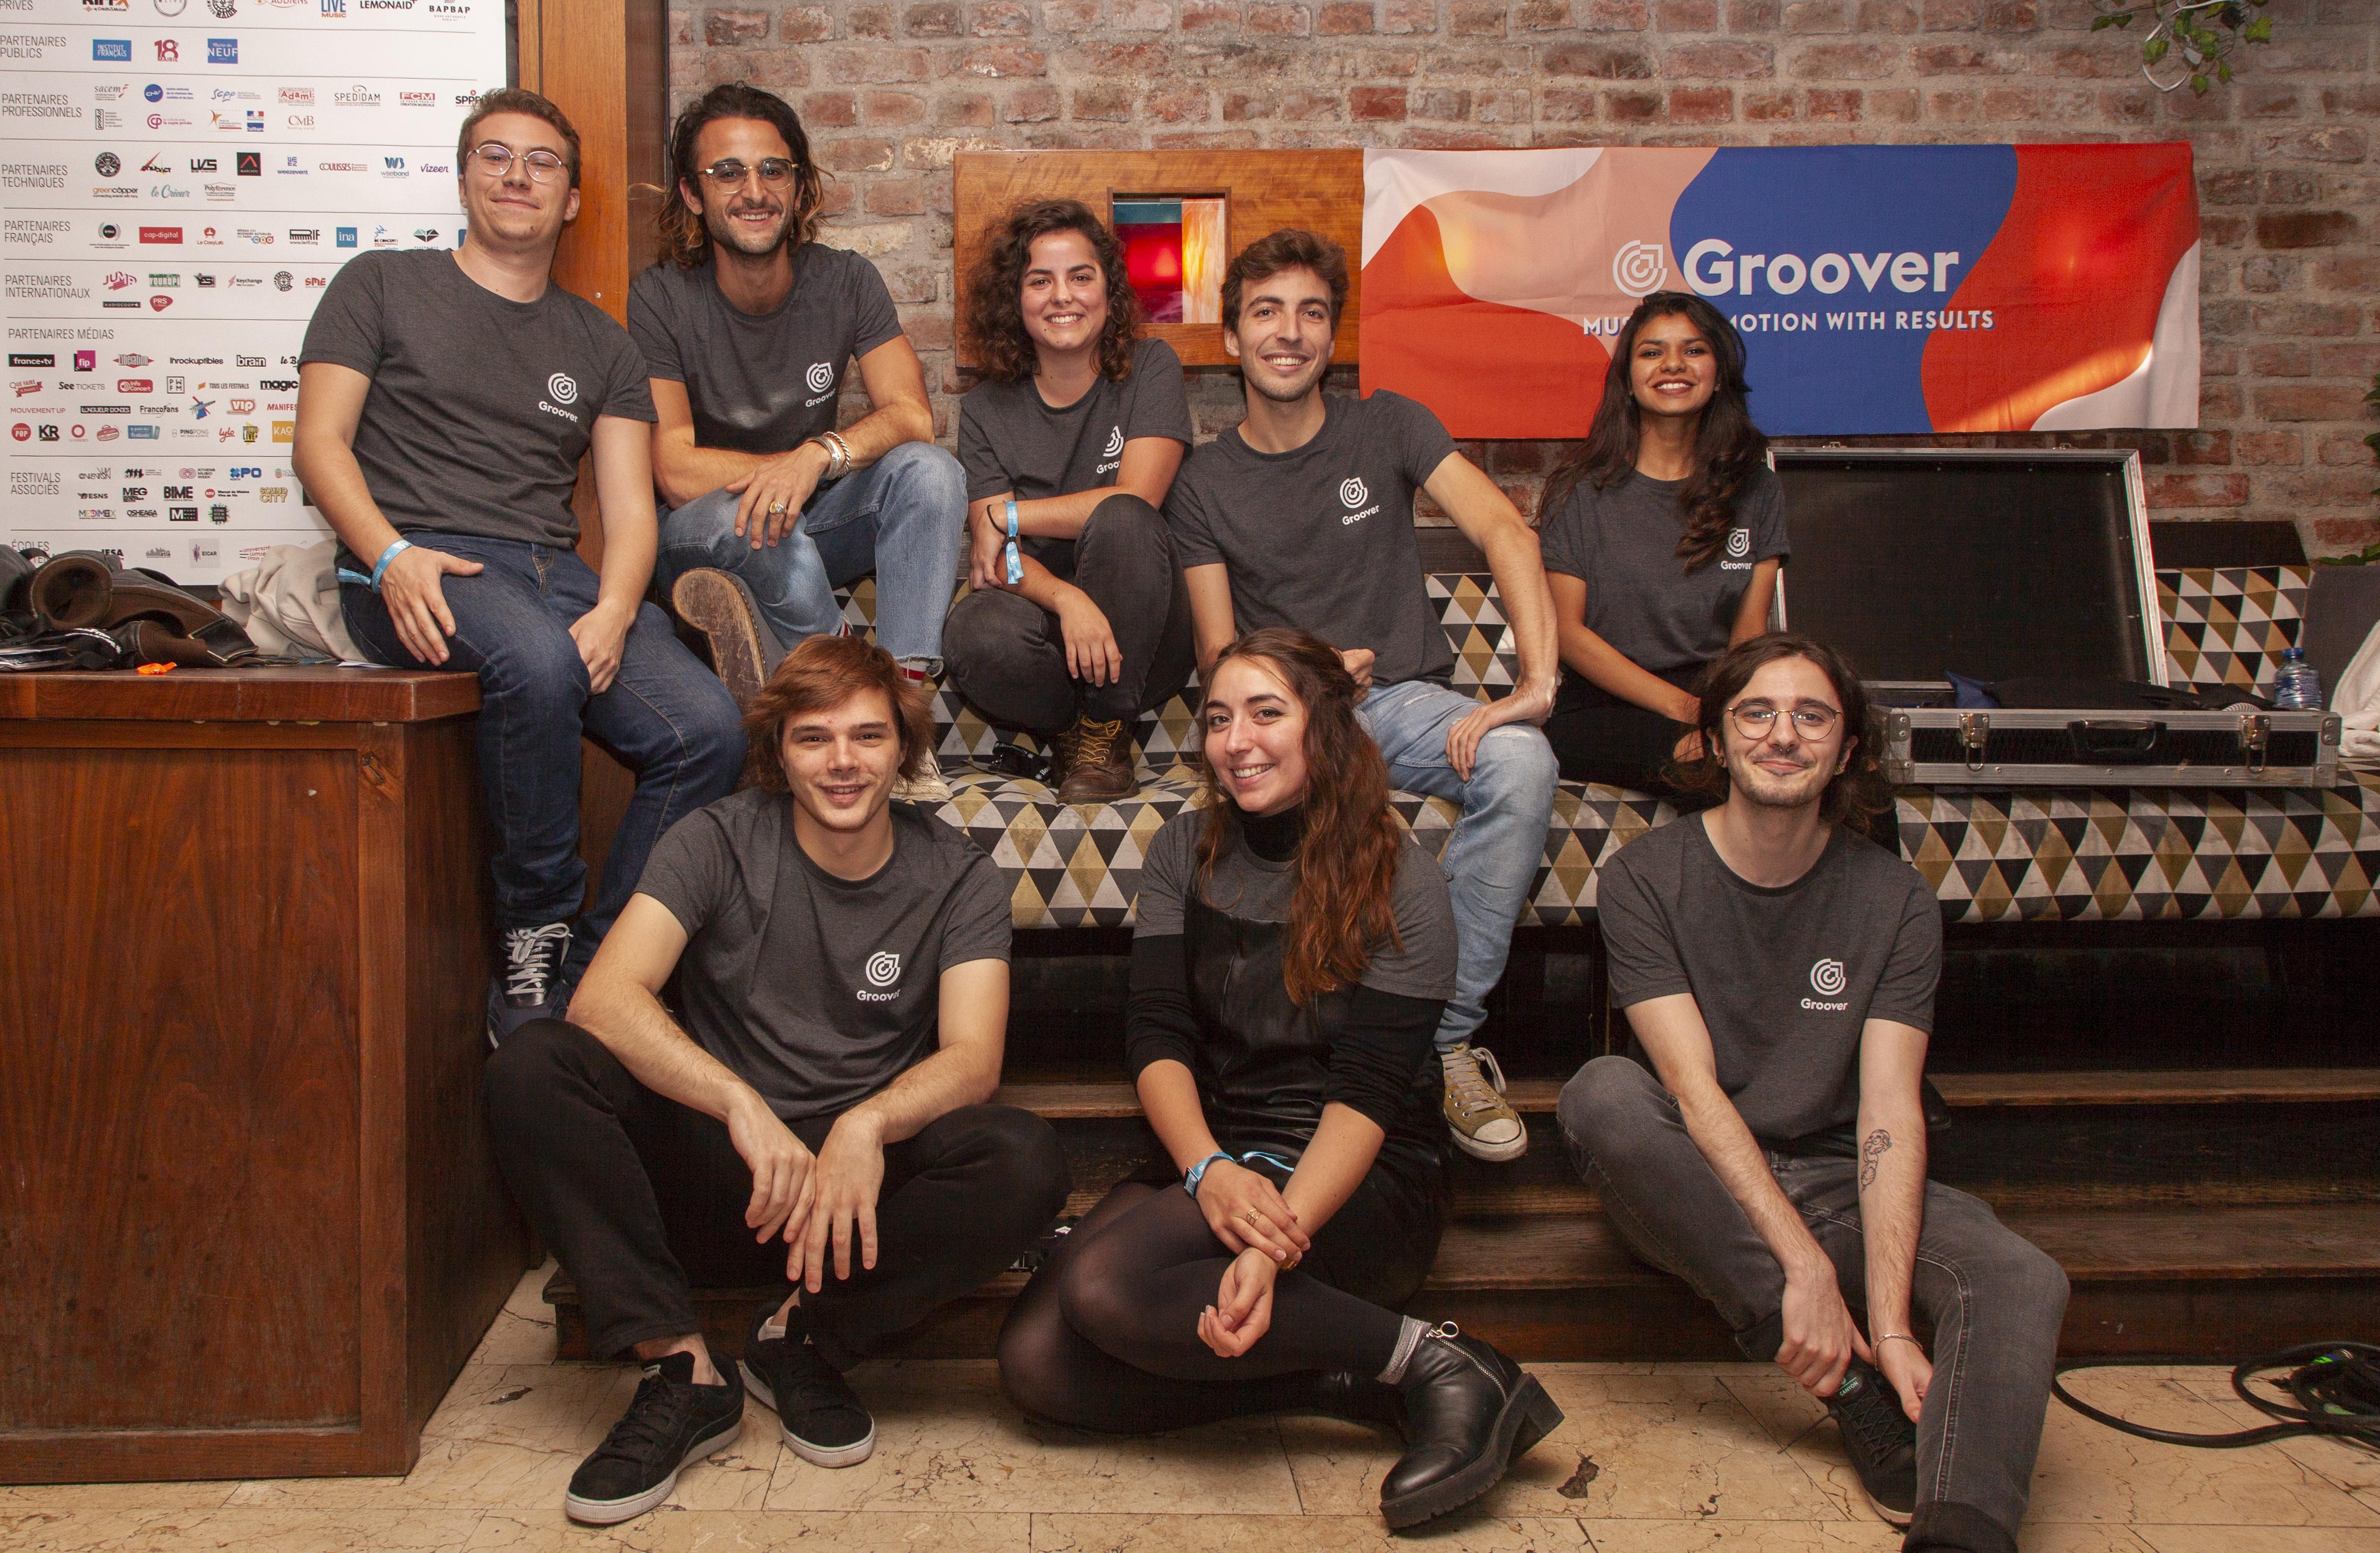 L'équipe Groover au Showcase